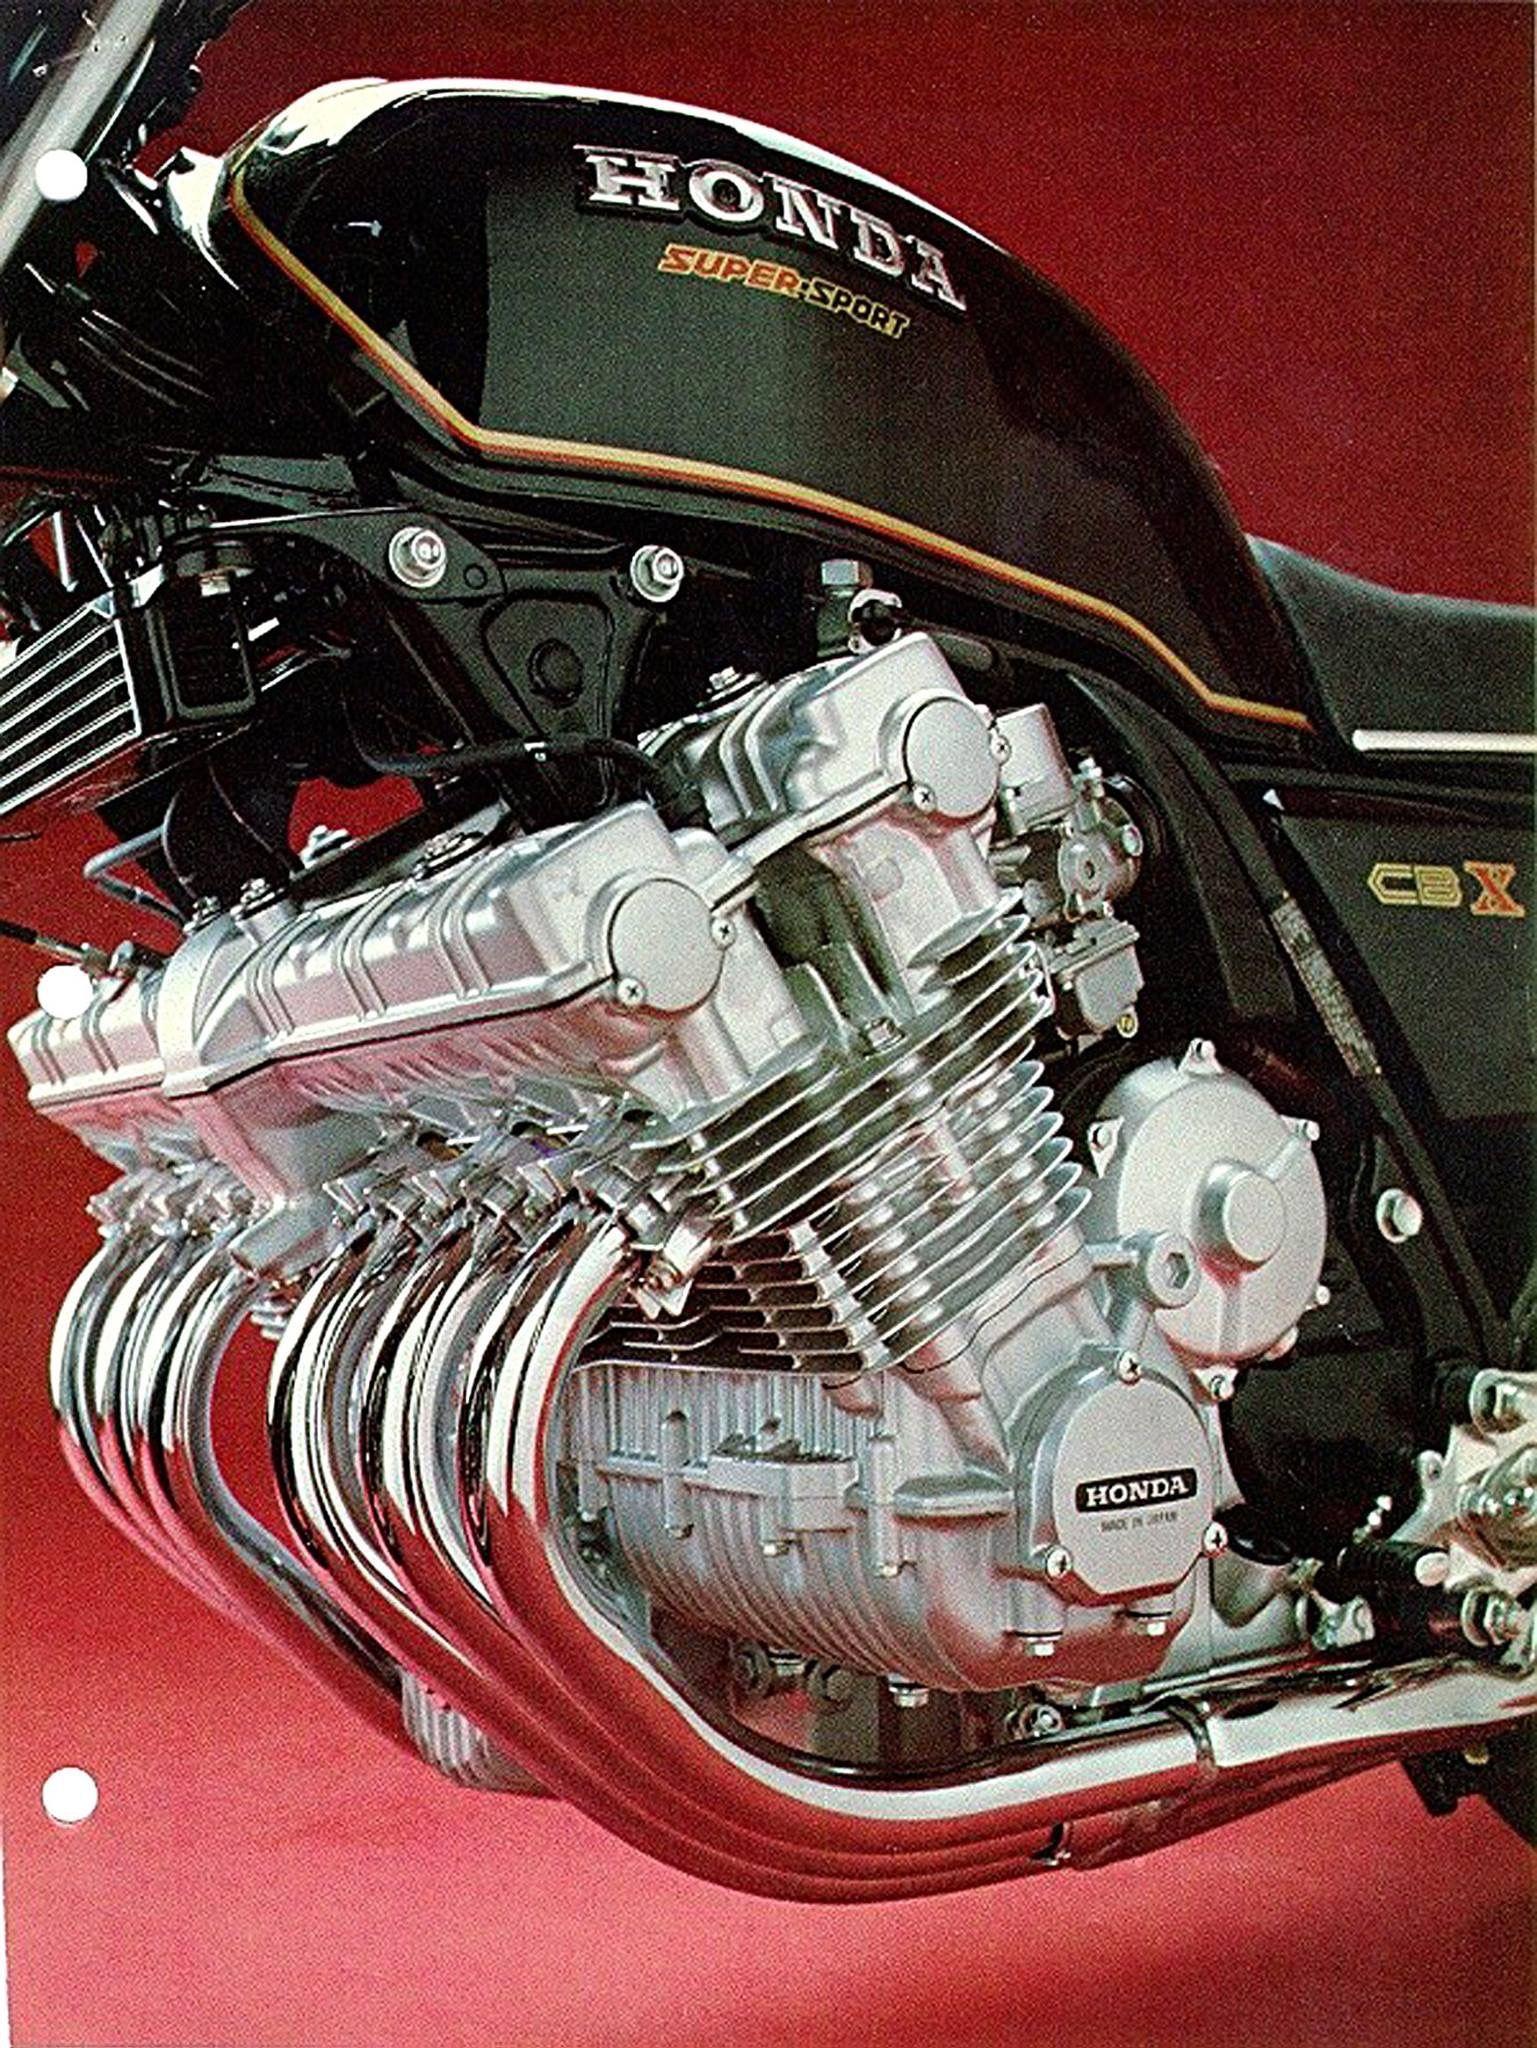 Pin De Rory Houston En Motorbike Parts Motos Clasicas Motos Honda Motos Deportivas Personalizadas